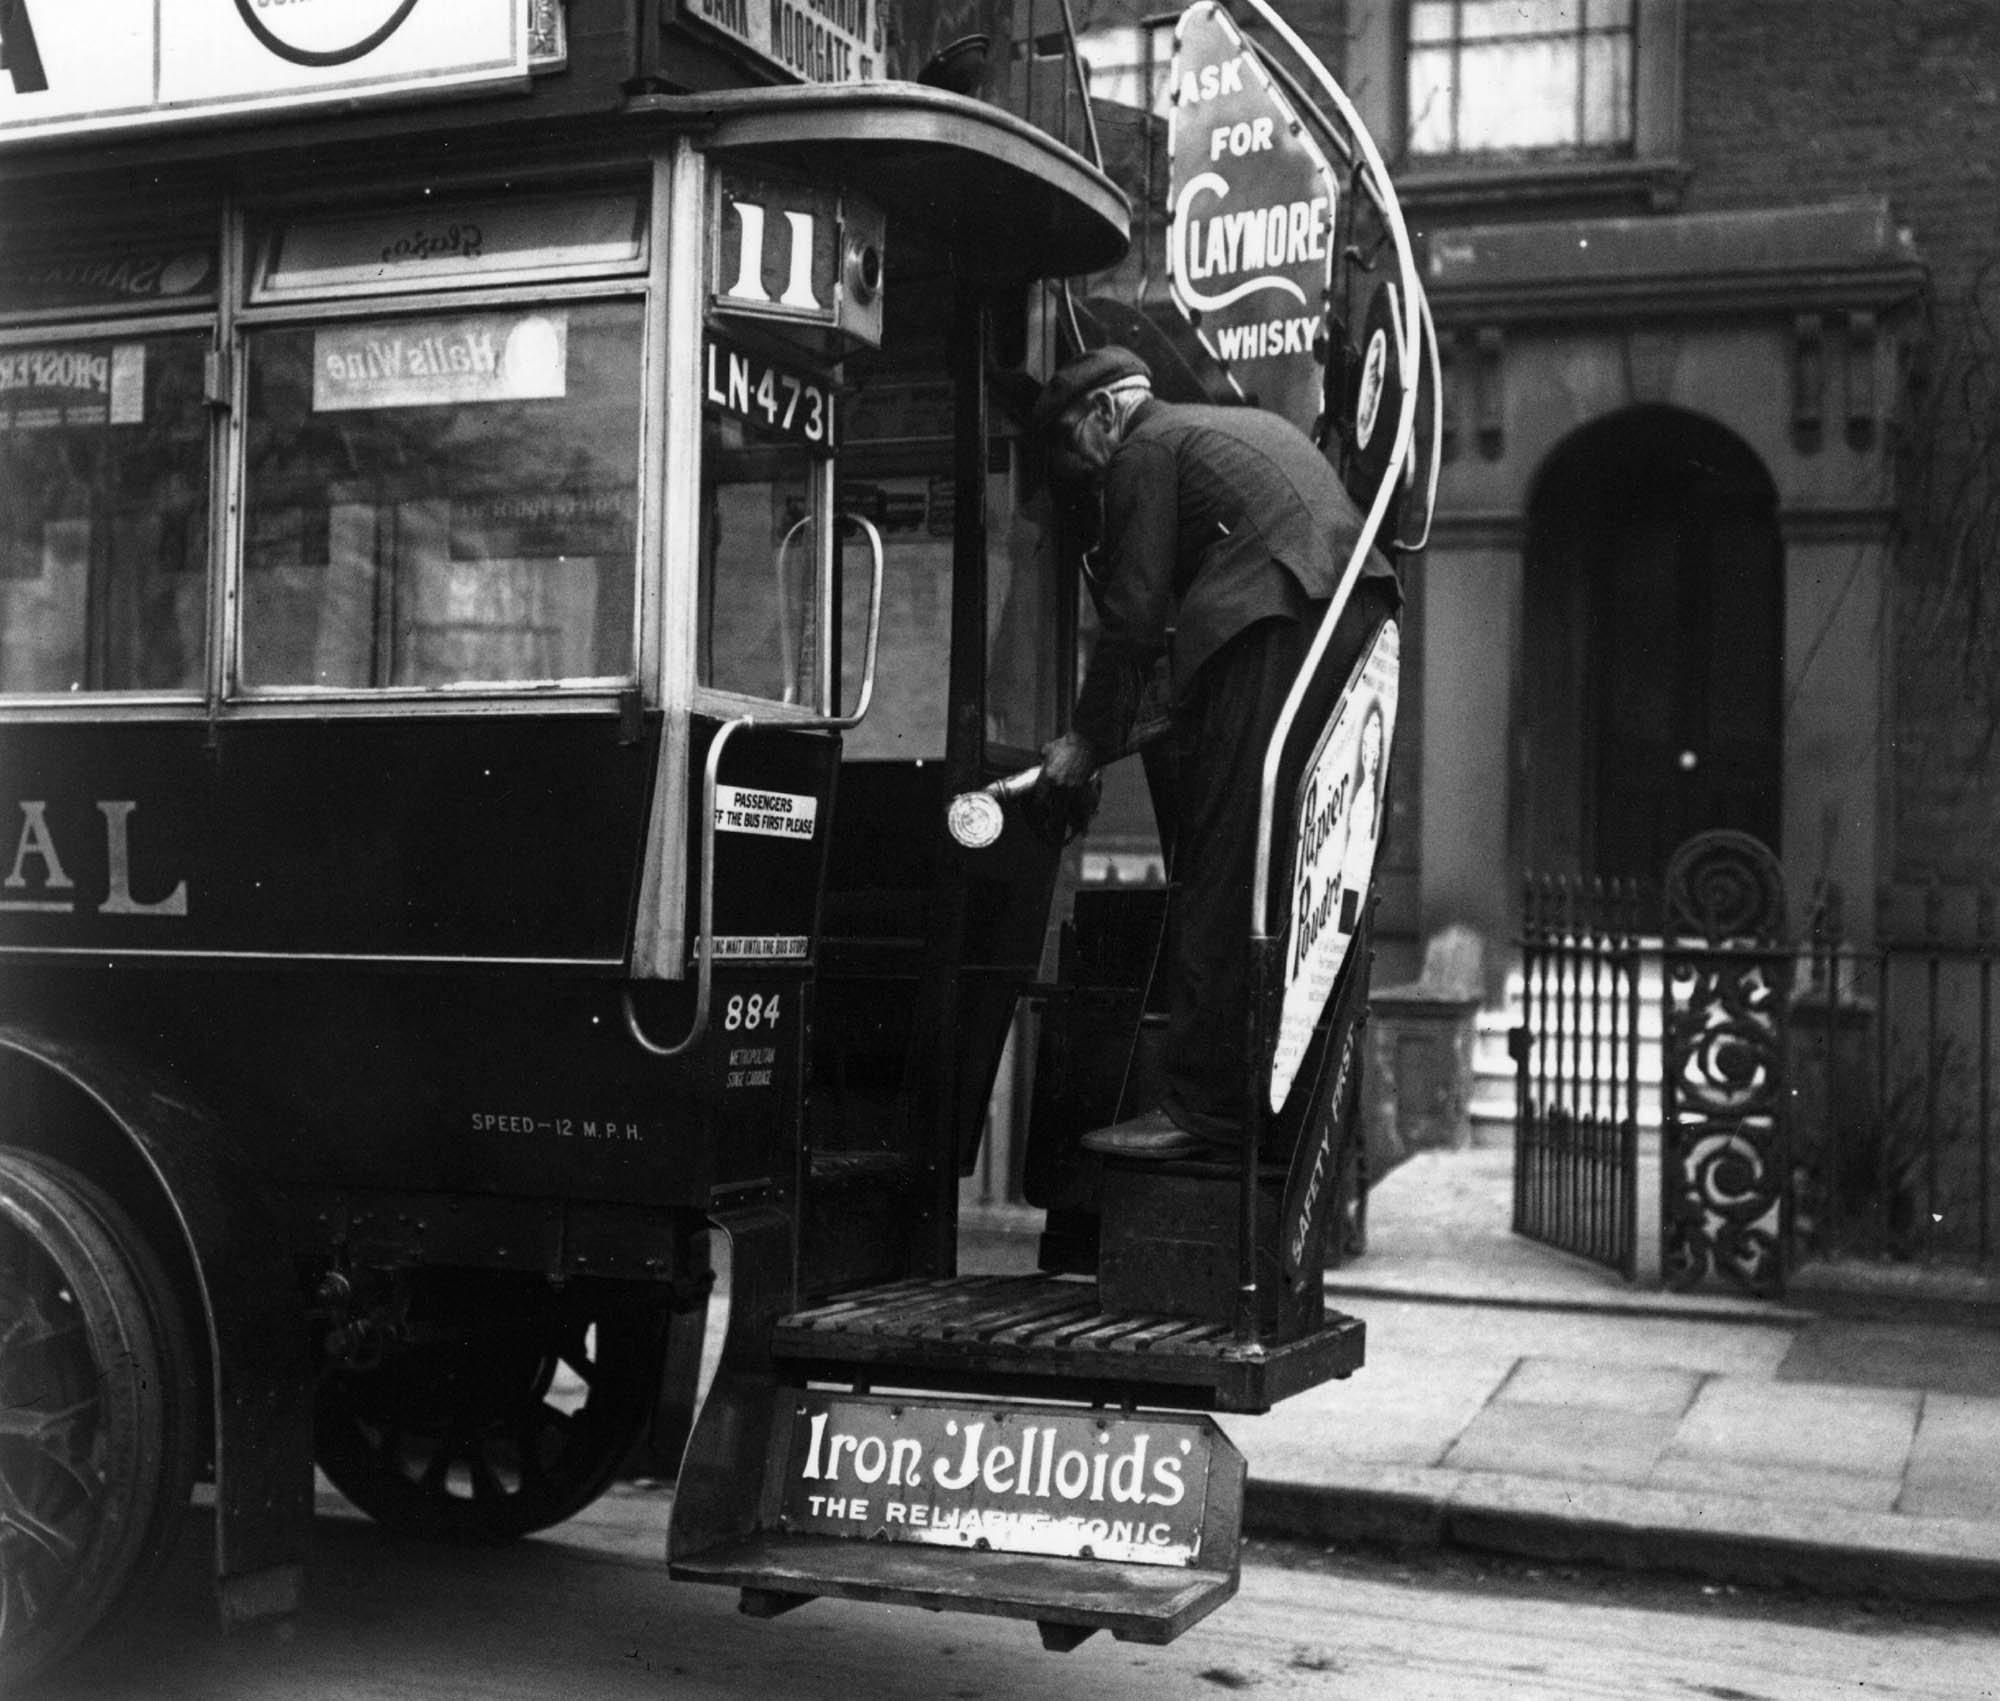 Pria menyemprot bus